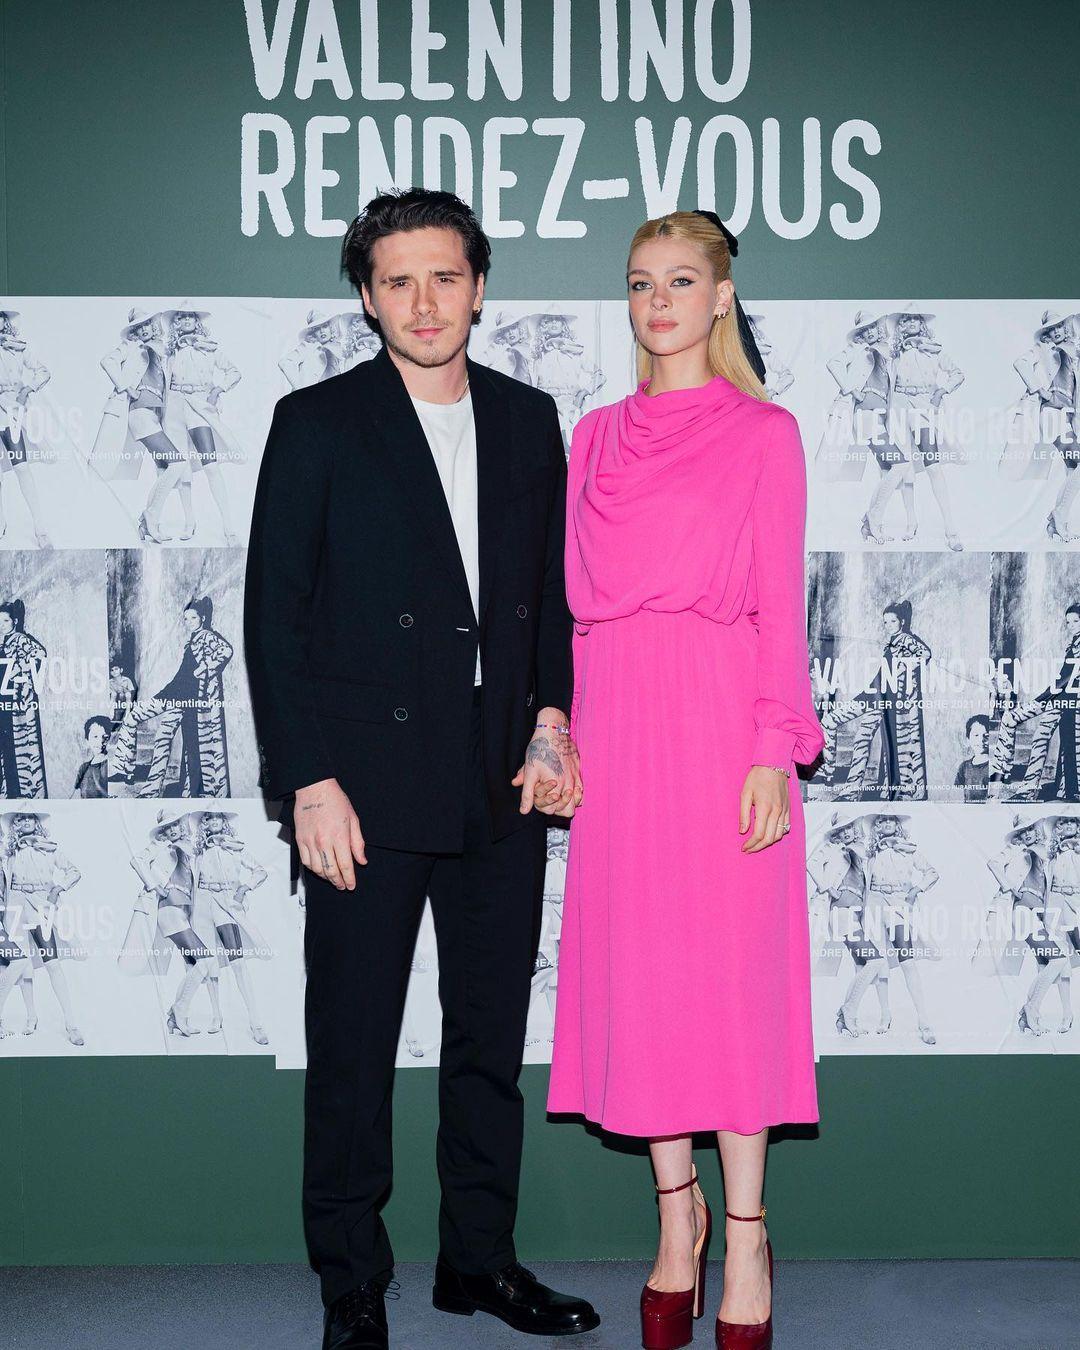 Brooklyn Beckham dan Nicola Peltz di Fashion Show Valentino Spring/Summer 2022